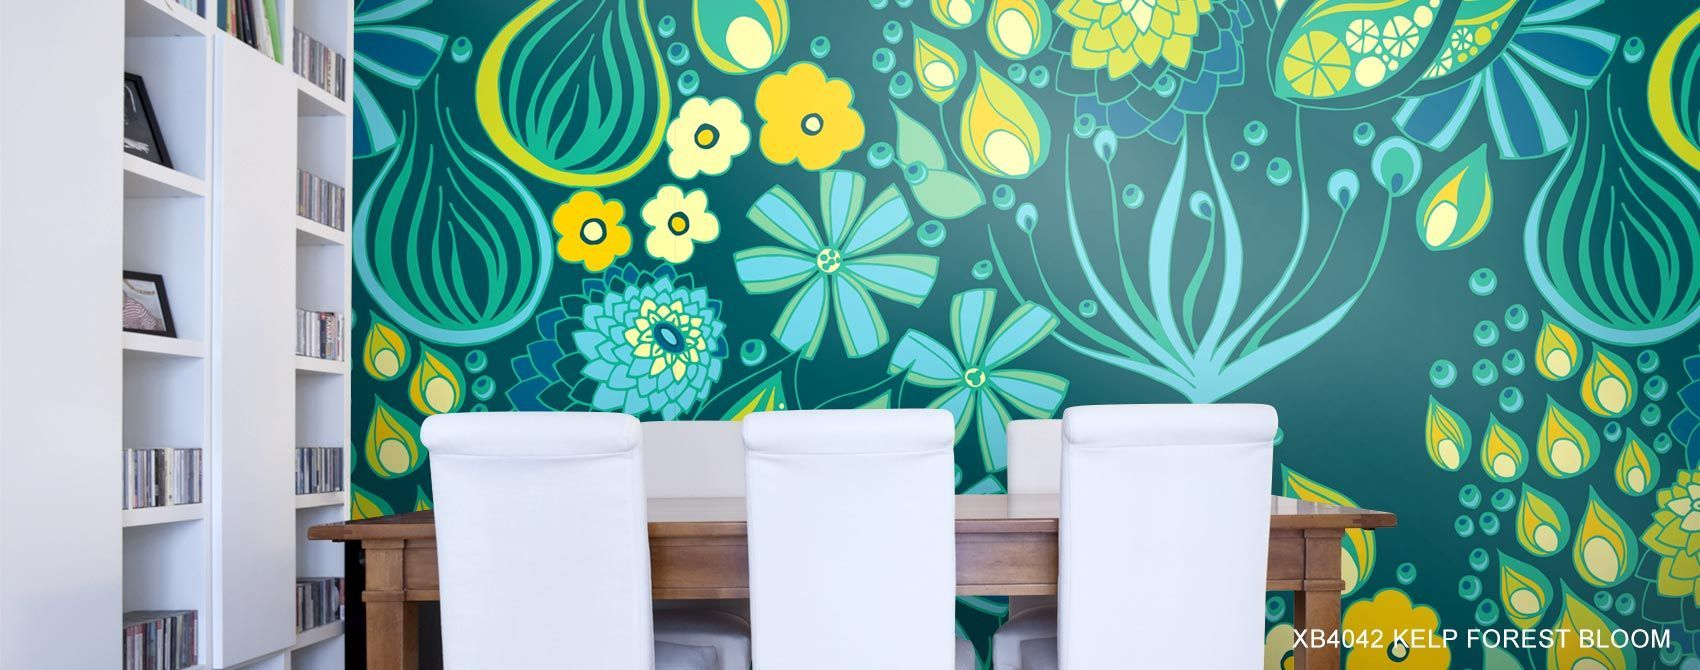 Removable Wallpaper Wallpaper Mural Wallpaper Removable Wallpaper